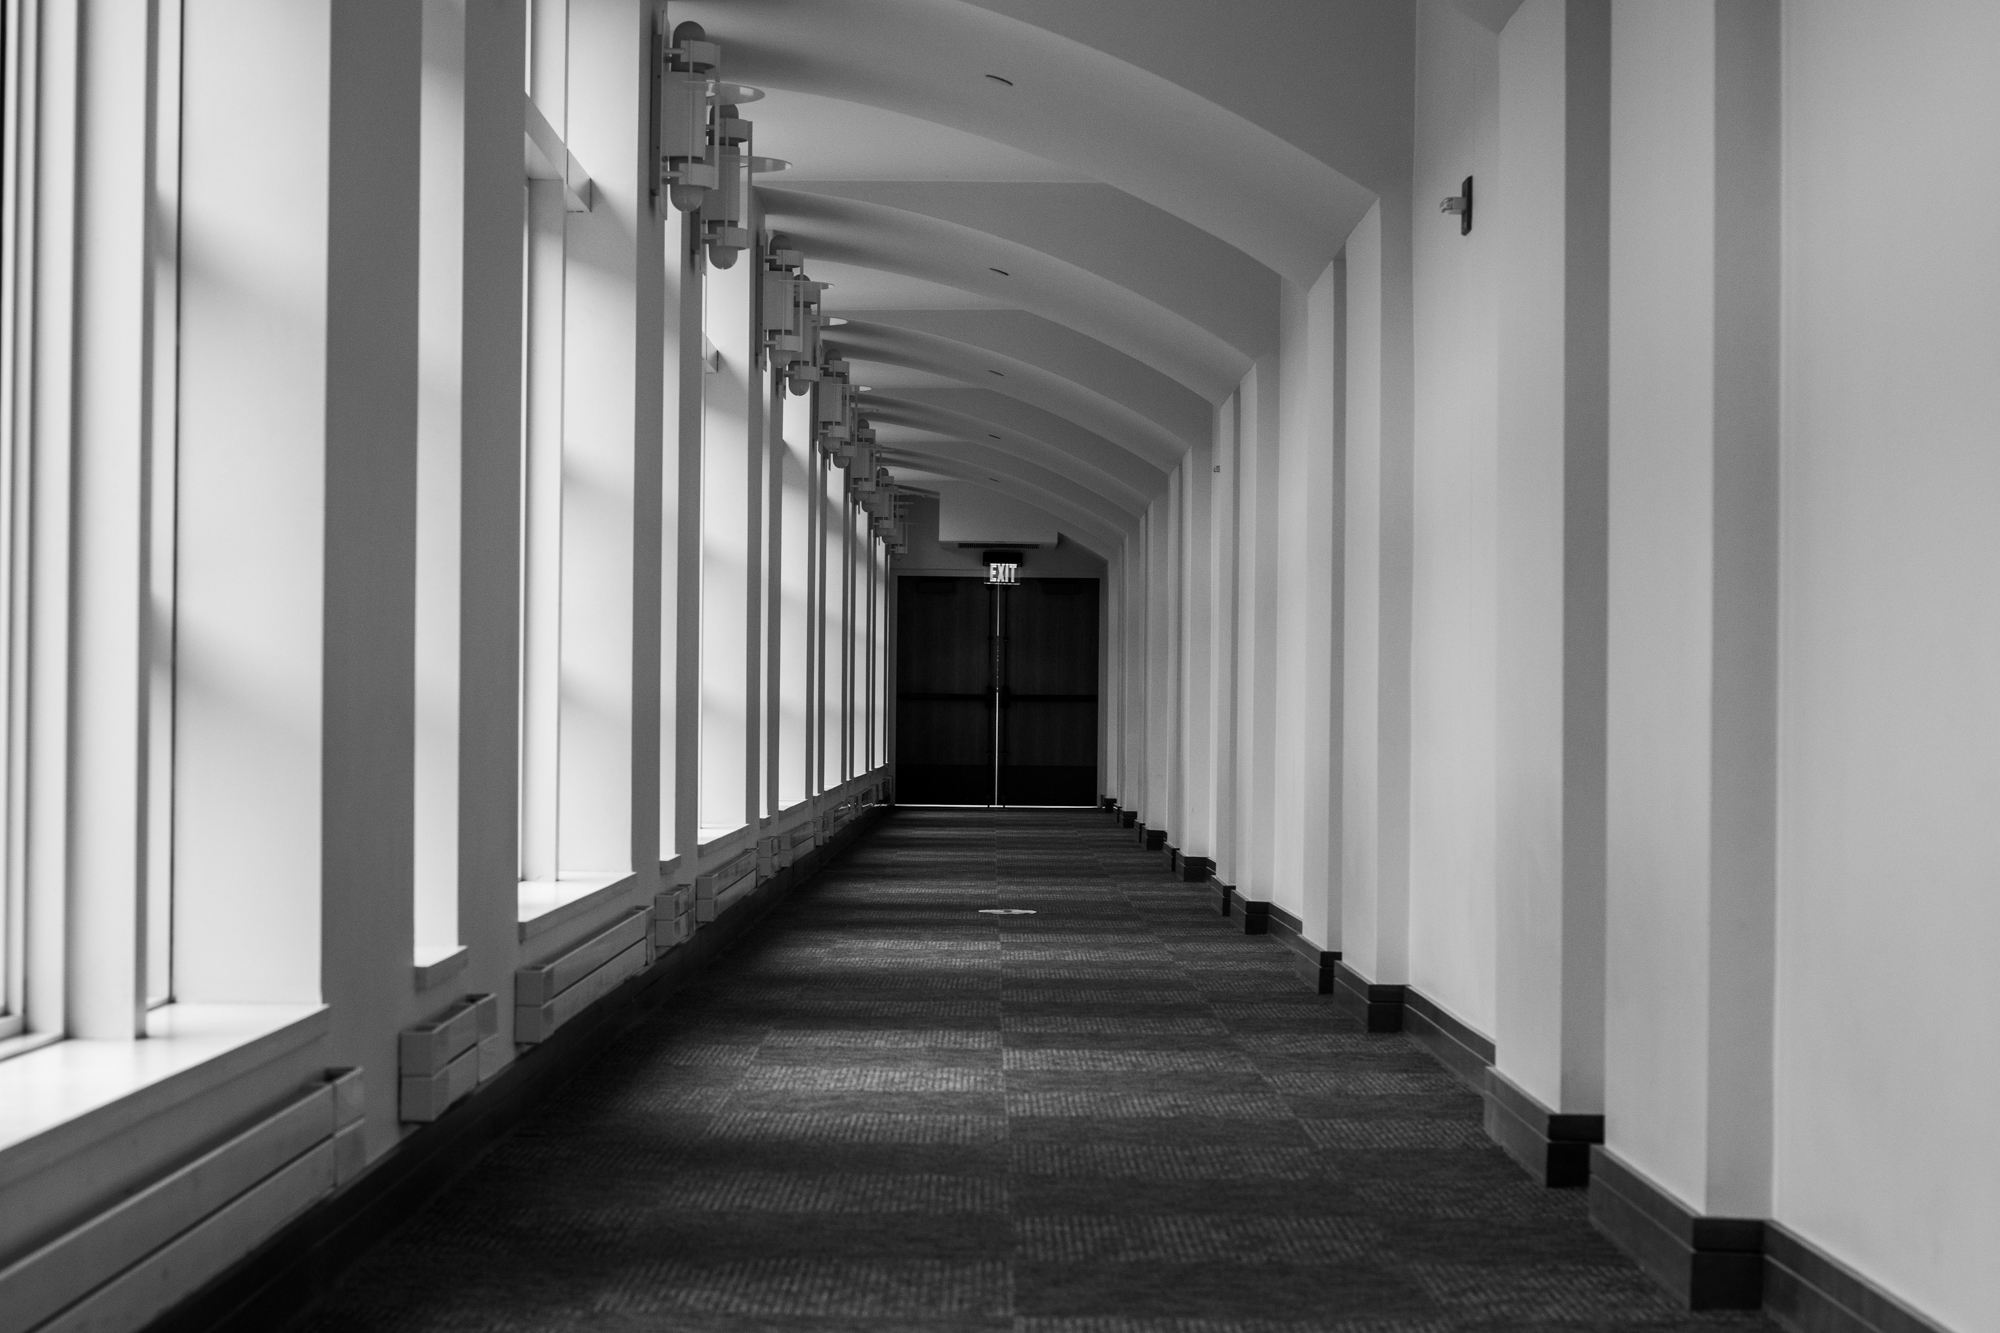 An empty hallway